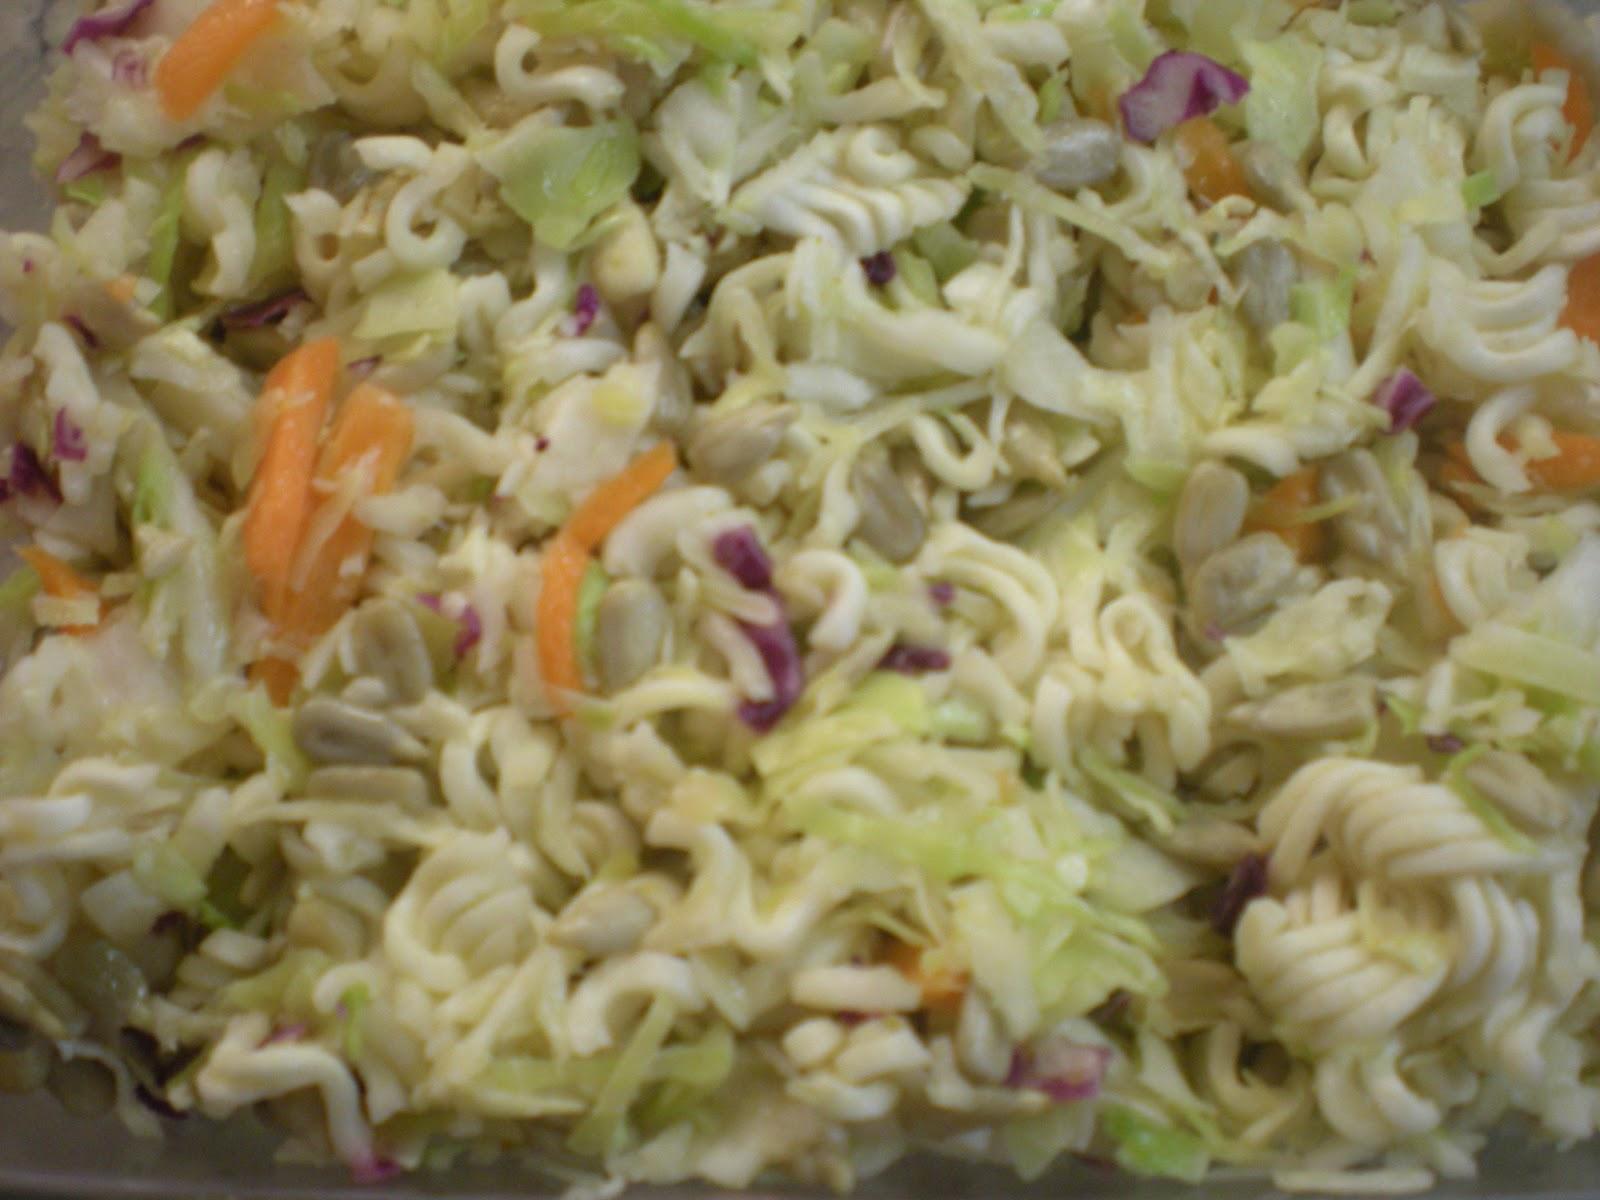 recipes noodles ramen in FAVORITE Noods Ramen Gone Salad Girls Mild: Adrienne's